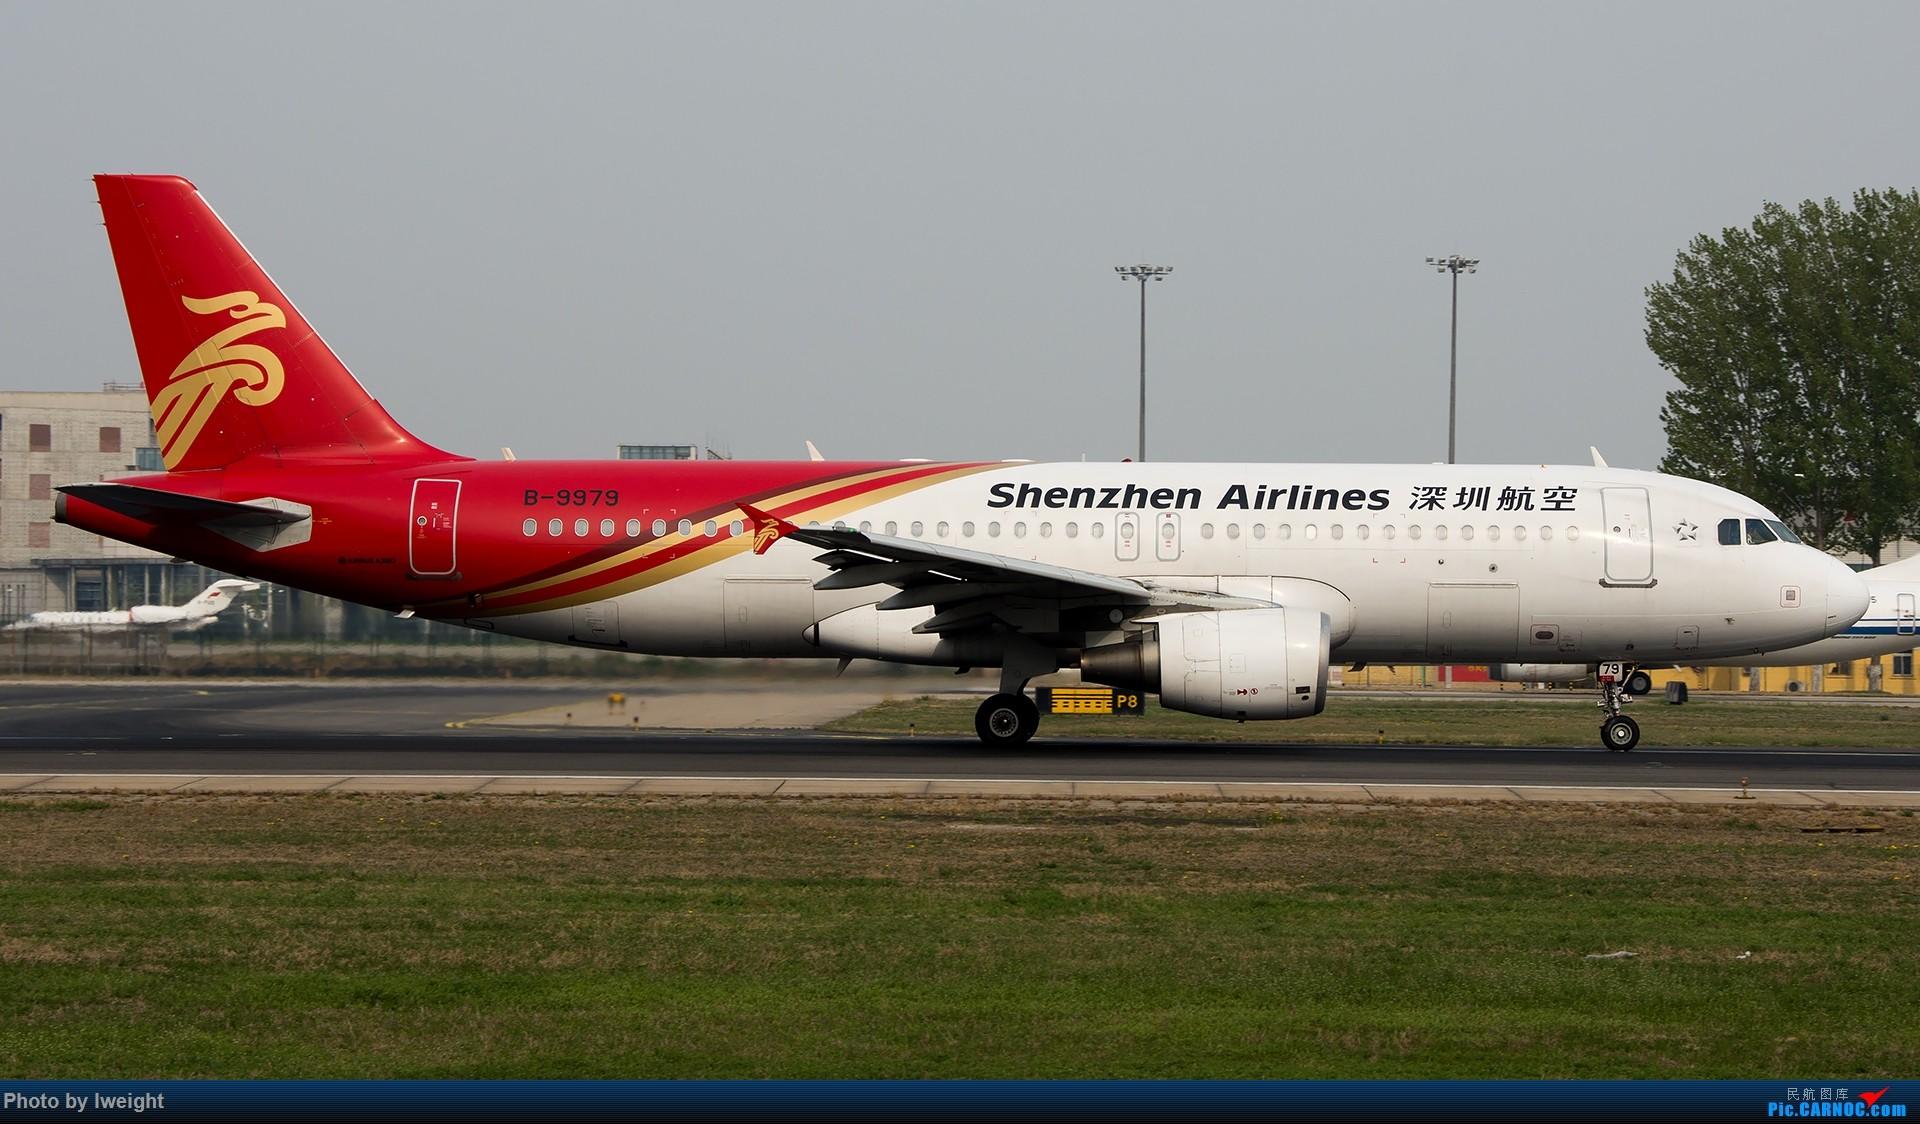 Re:[原创]霾,18R,高密度 AIRBUS A320-200 B-9979 中国北京首都国际机场